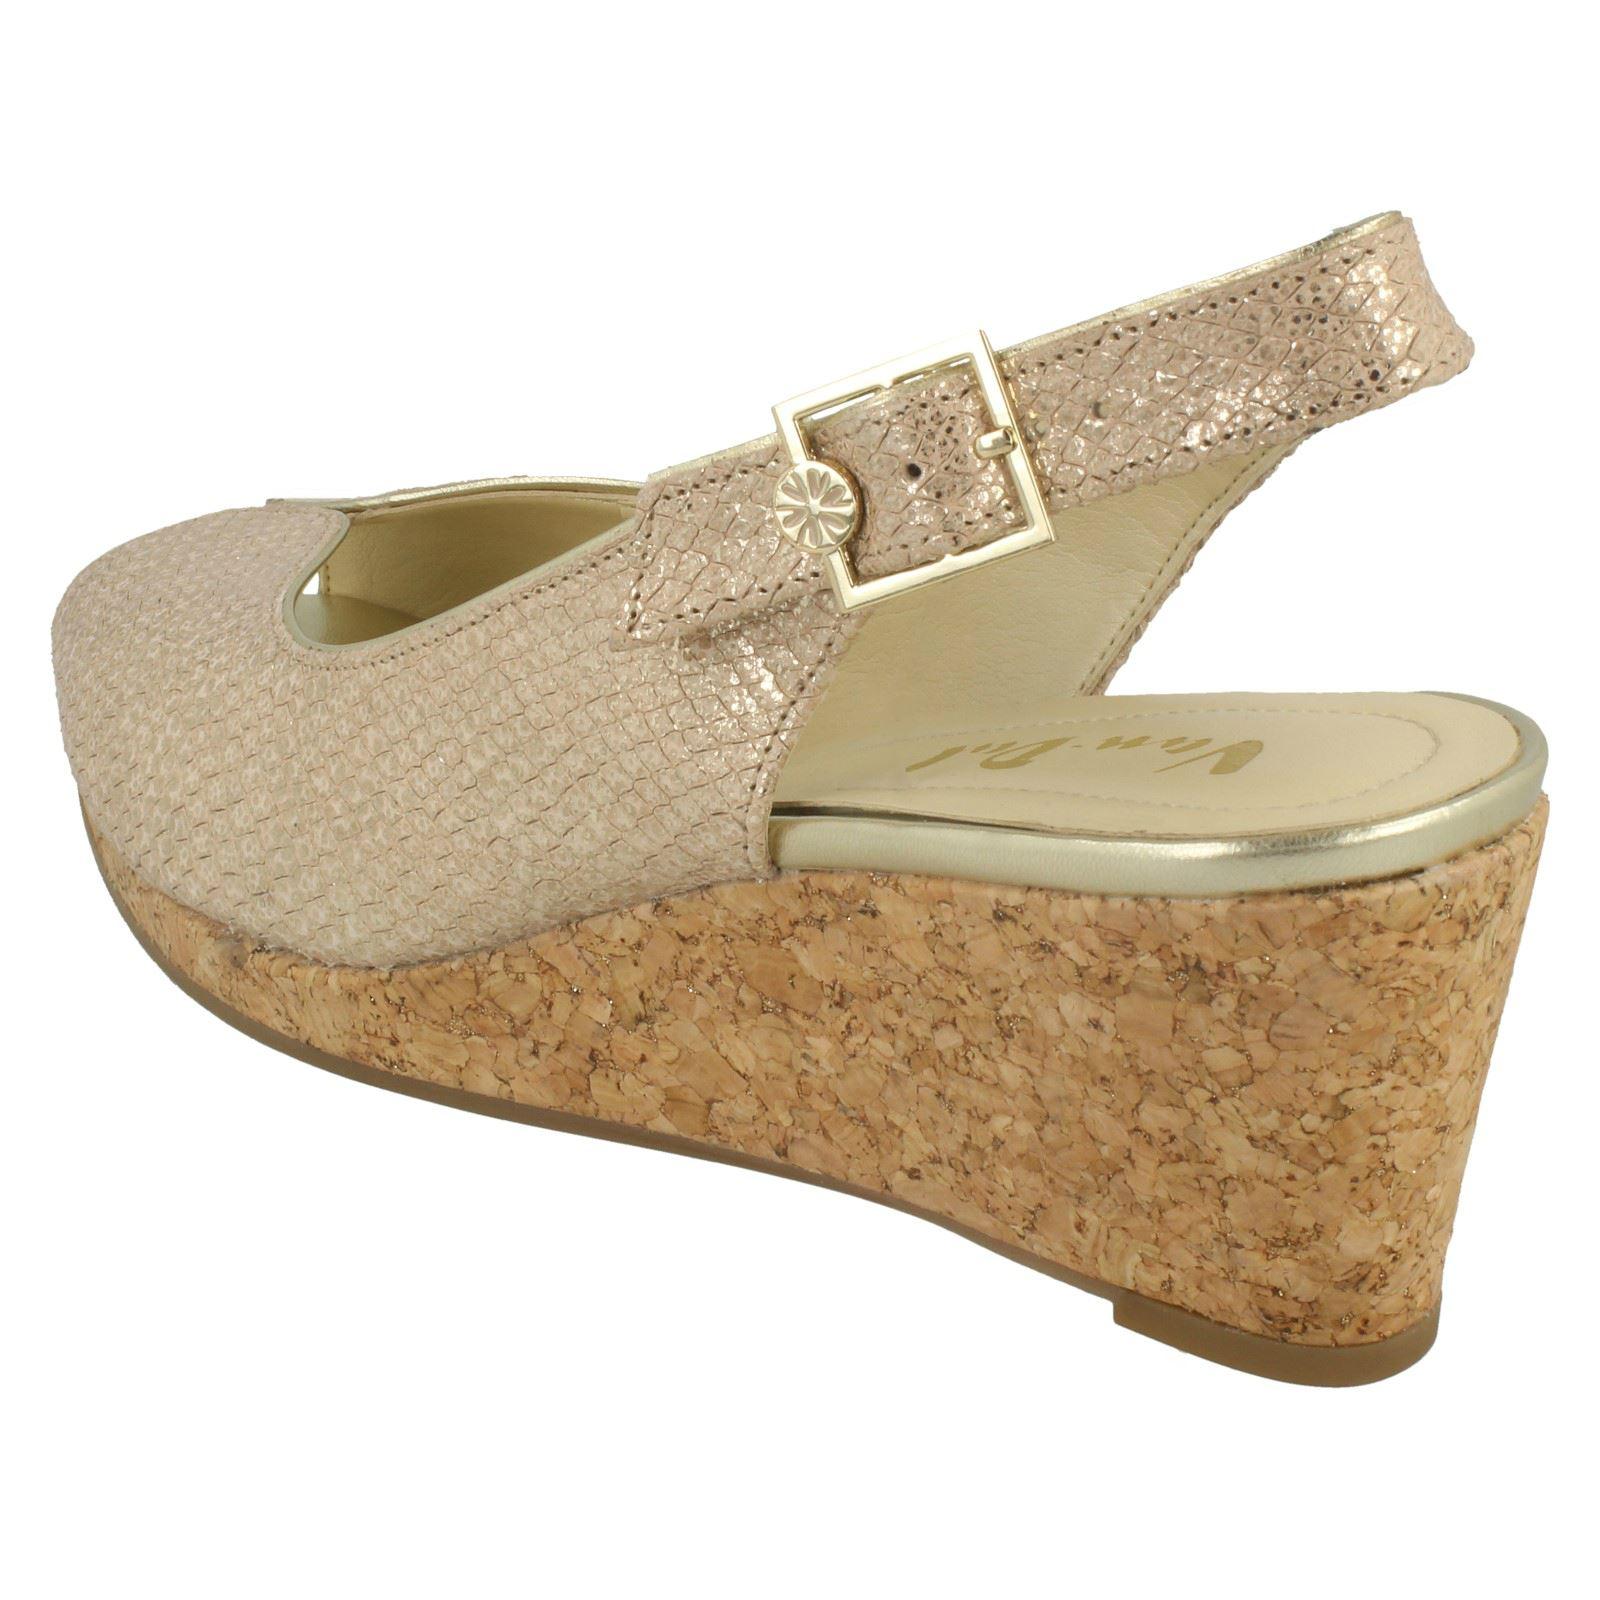 Ladies-Van-Dal-Cork-Wedge-Sandals-Gable thumbnail 3